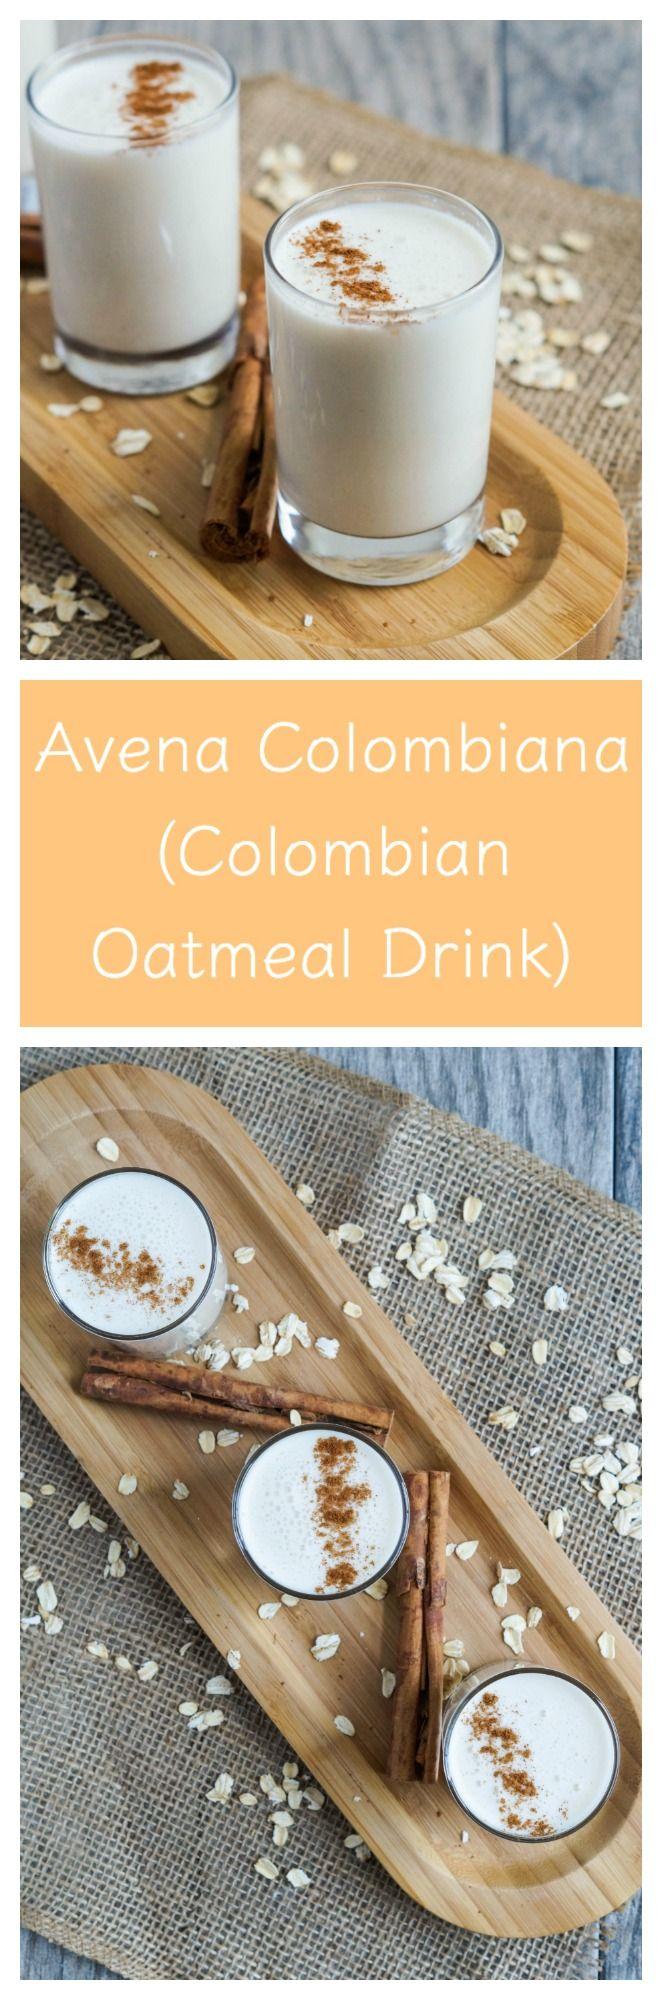 Avena Colombiana (Colombian Oatmeal Drink)